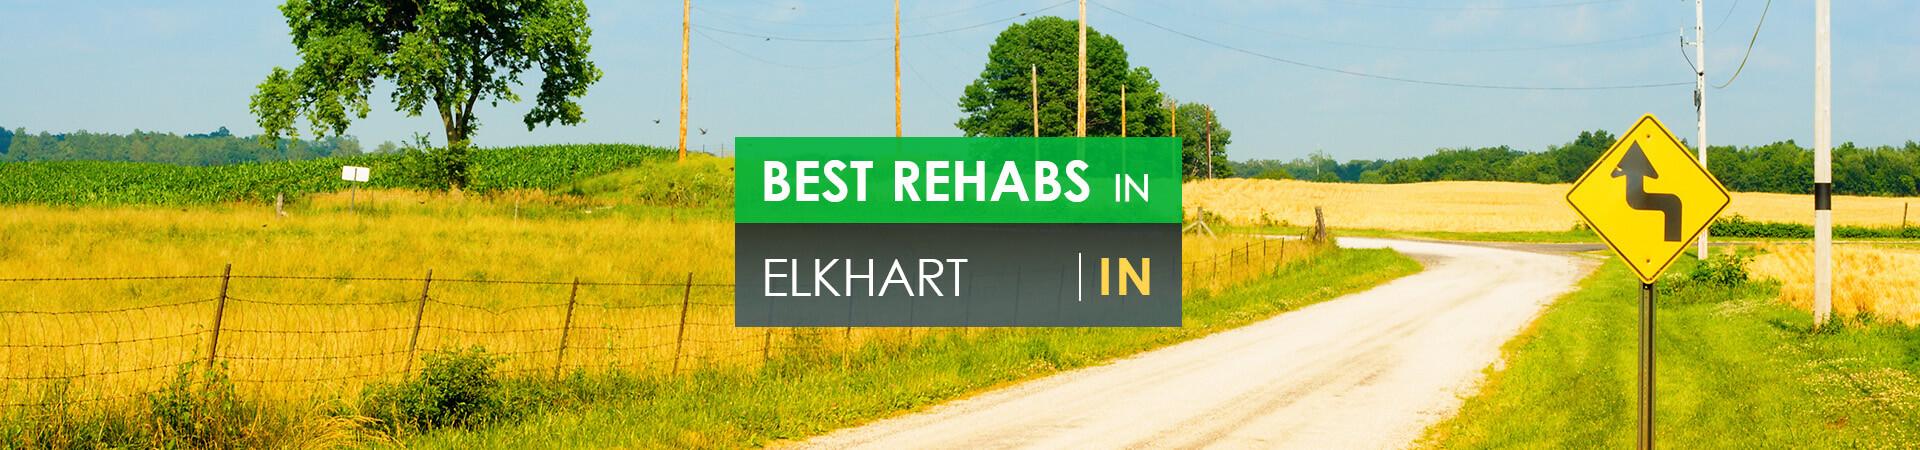 Best rehabs in Elkhart, IN